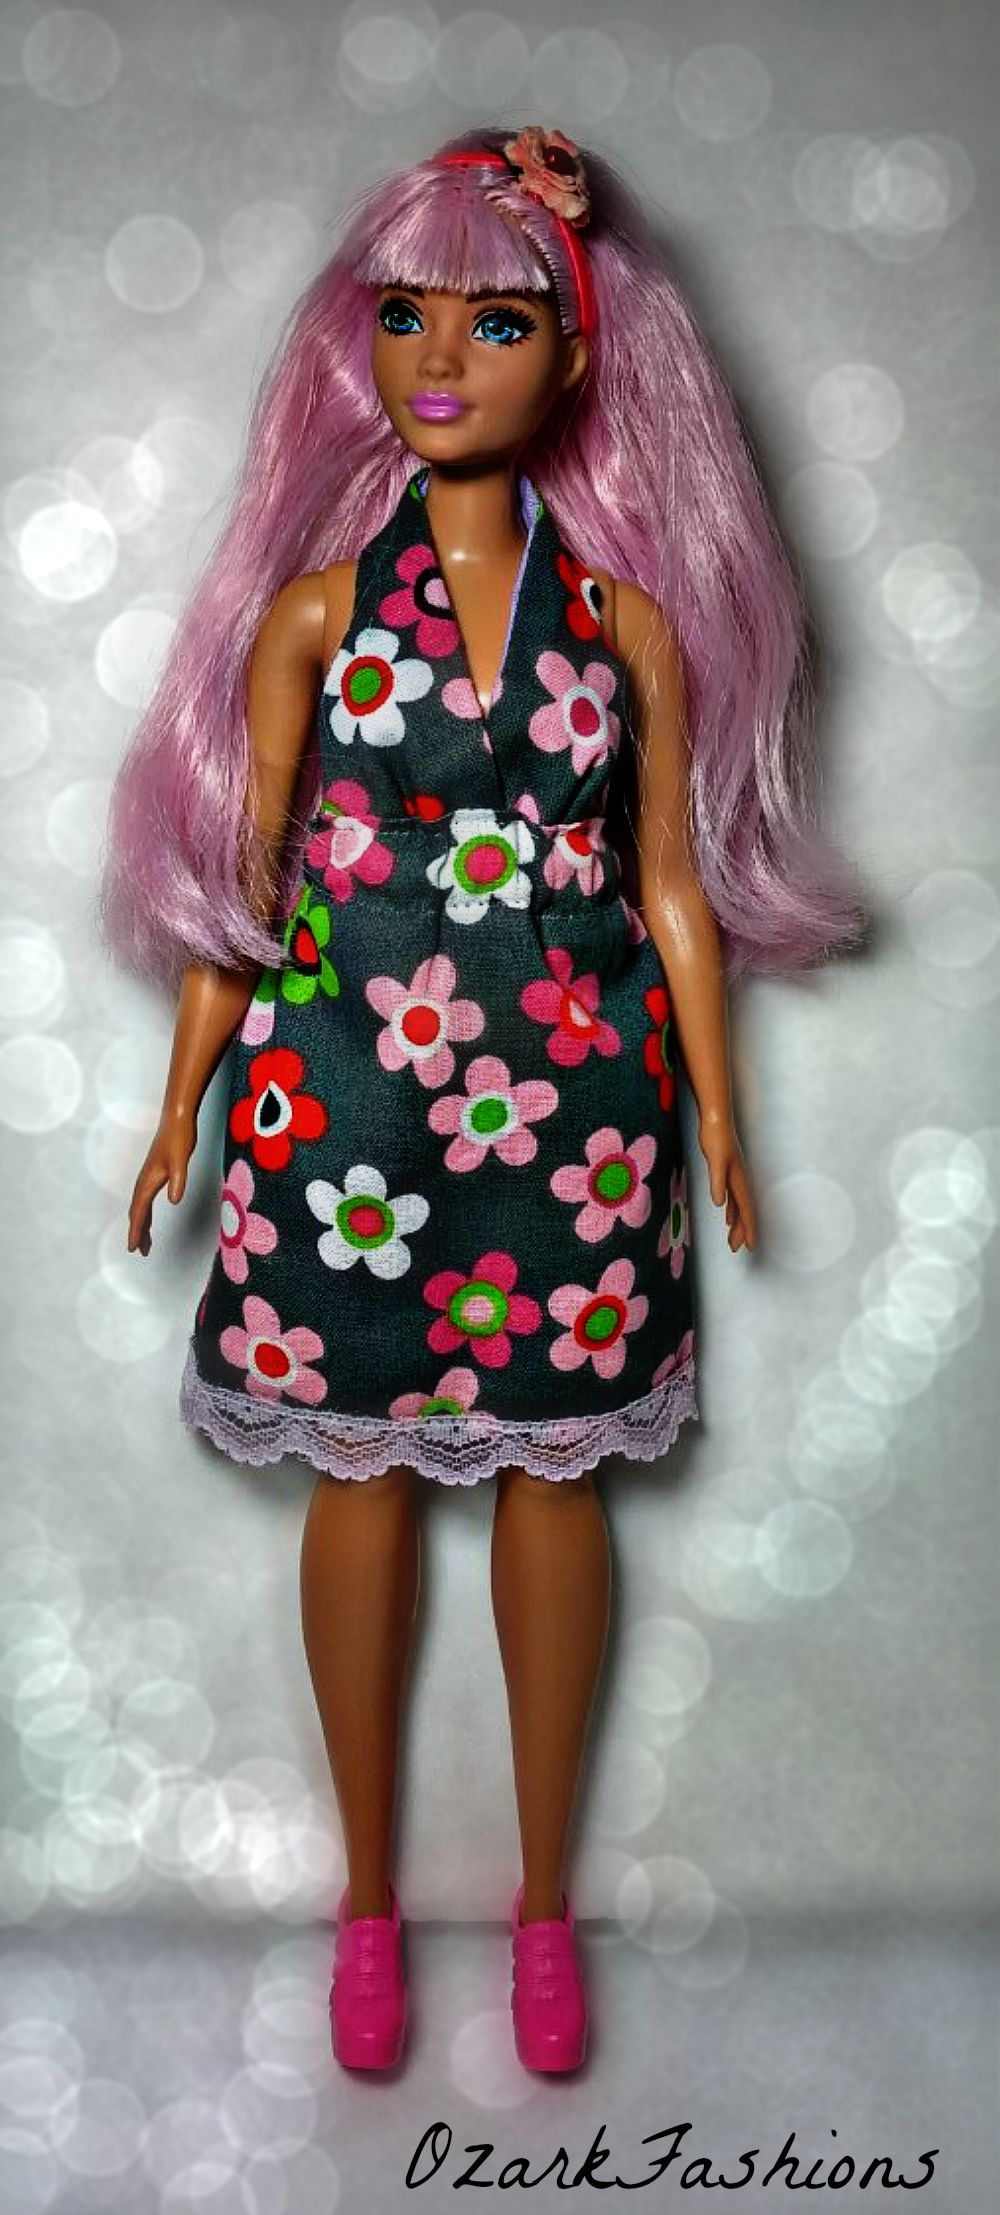 6db25ee63b Barbie doll Dress - One Size Fits ALL Barbies - Curvy Barbie